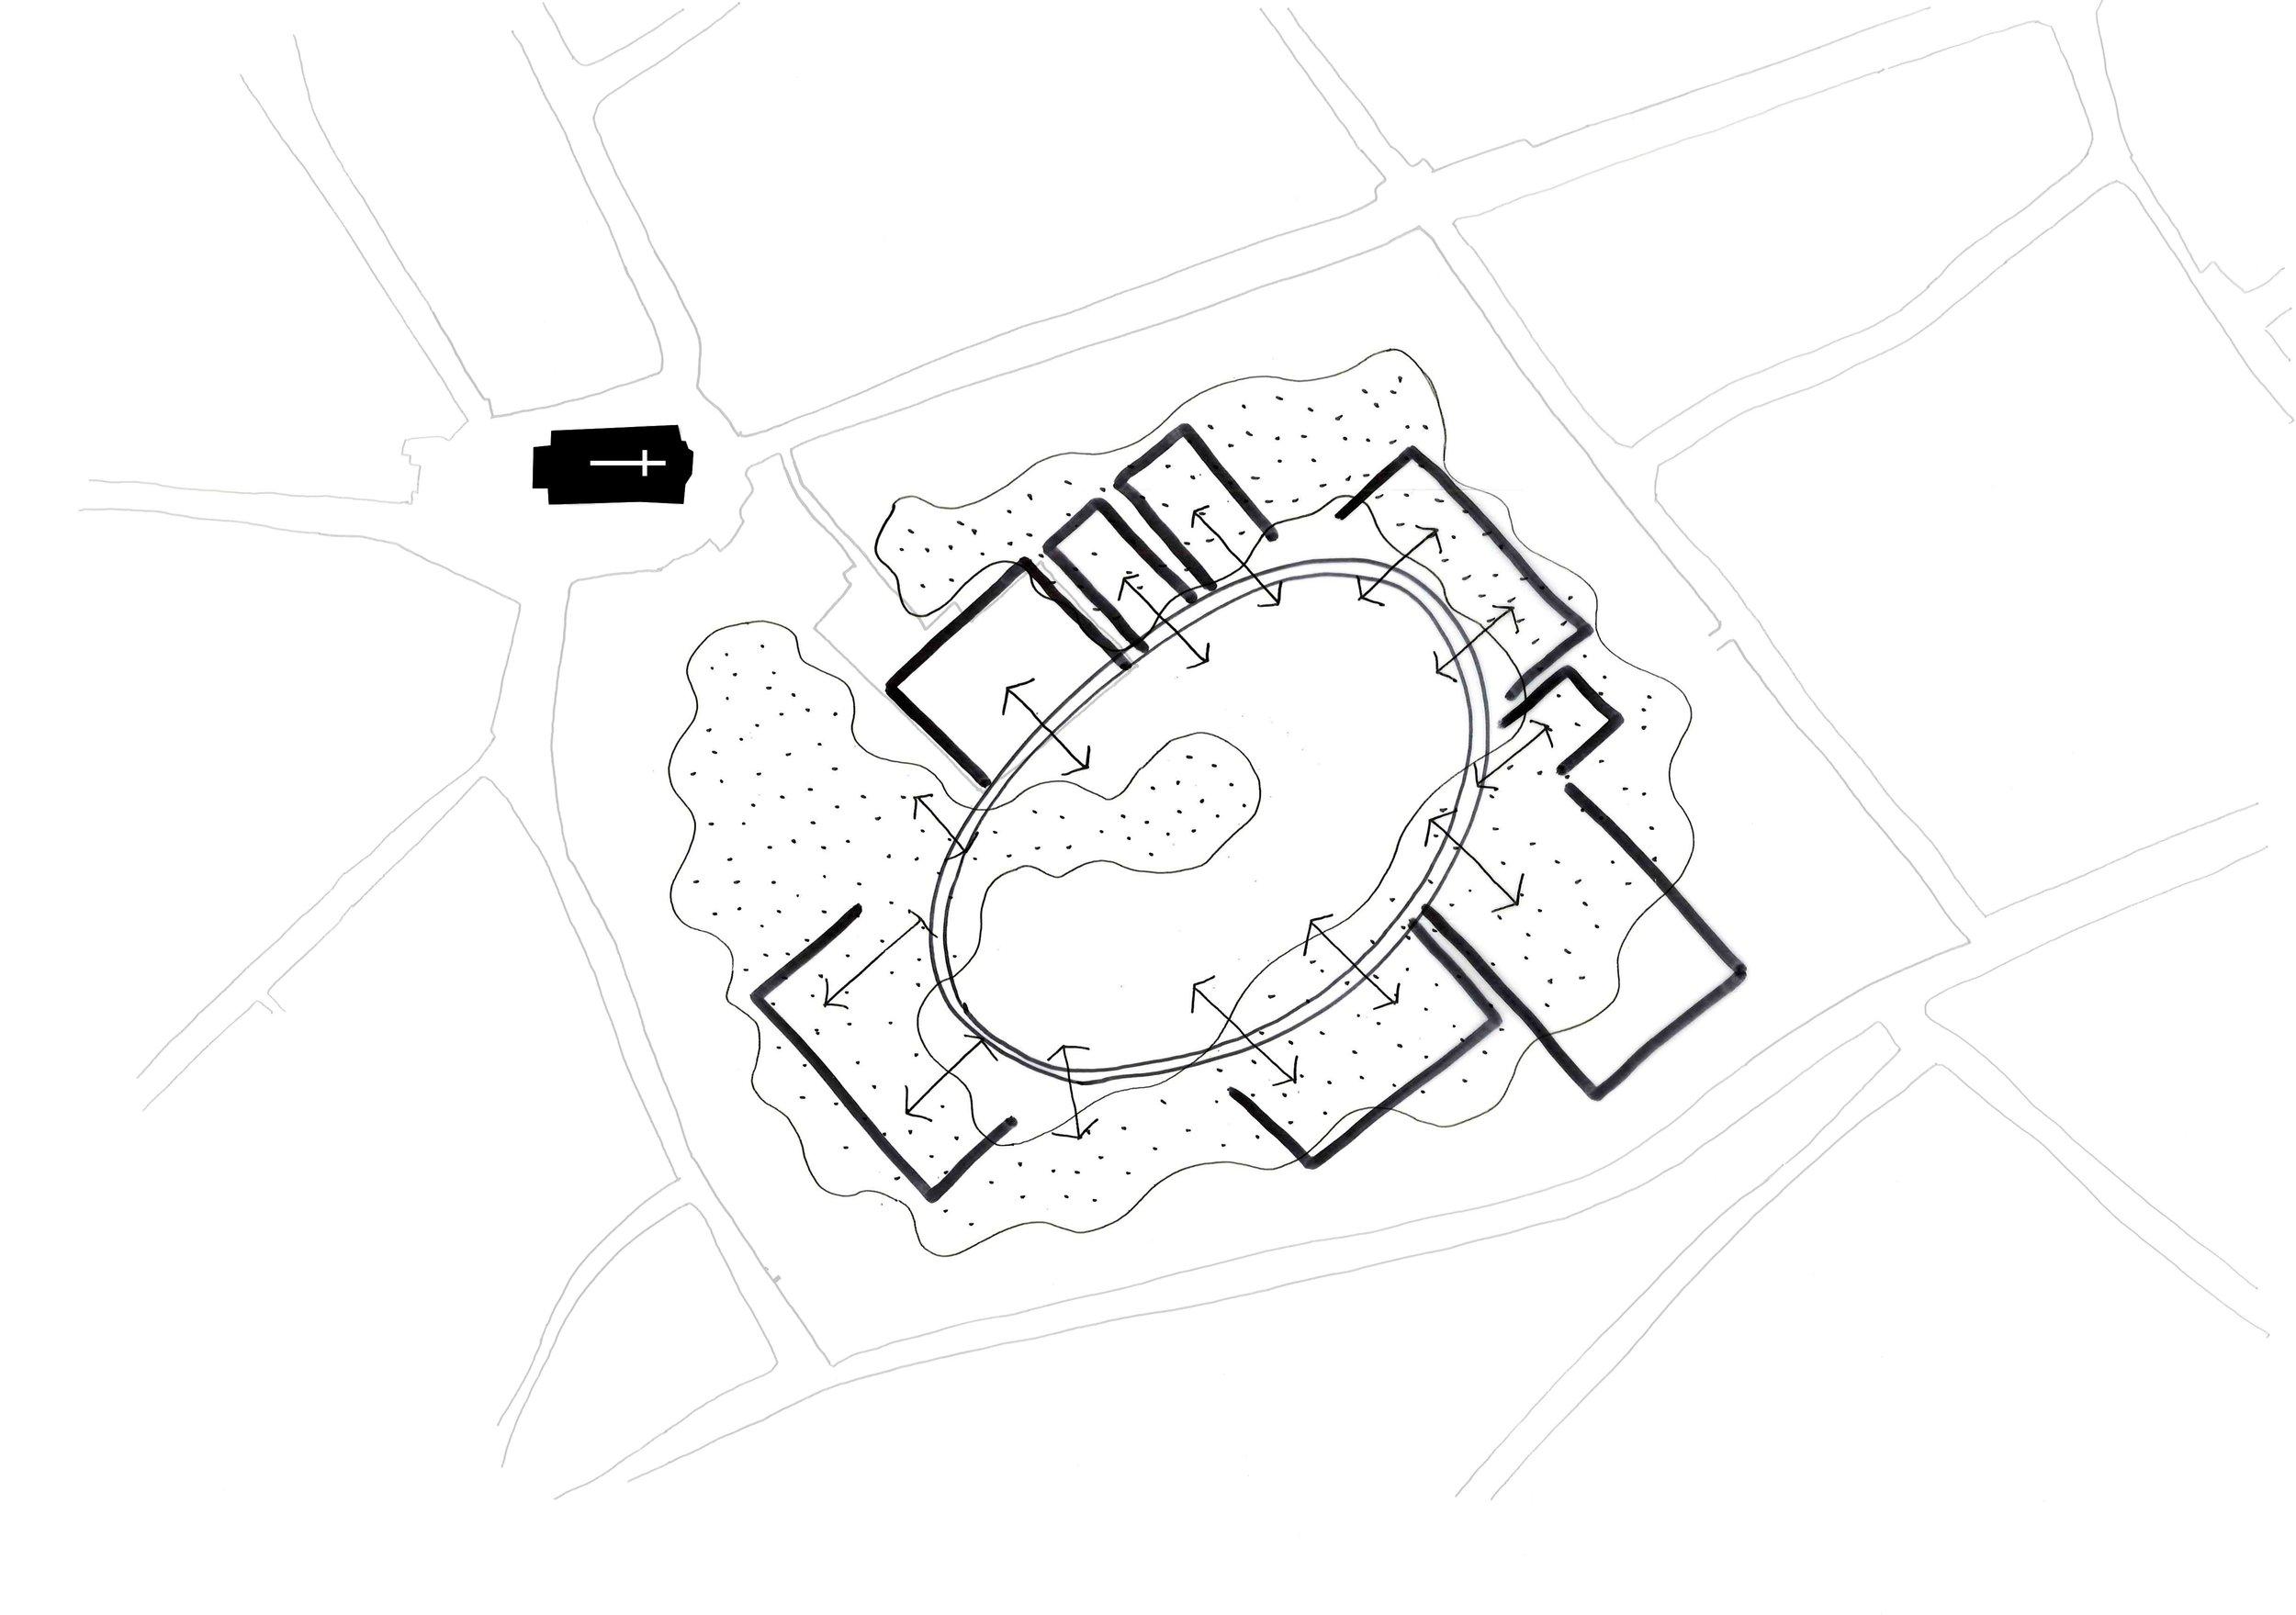 DHOOGE&MEGANCK-ZOMERGEM-MP6.jpg